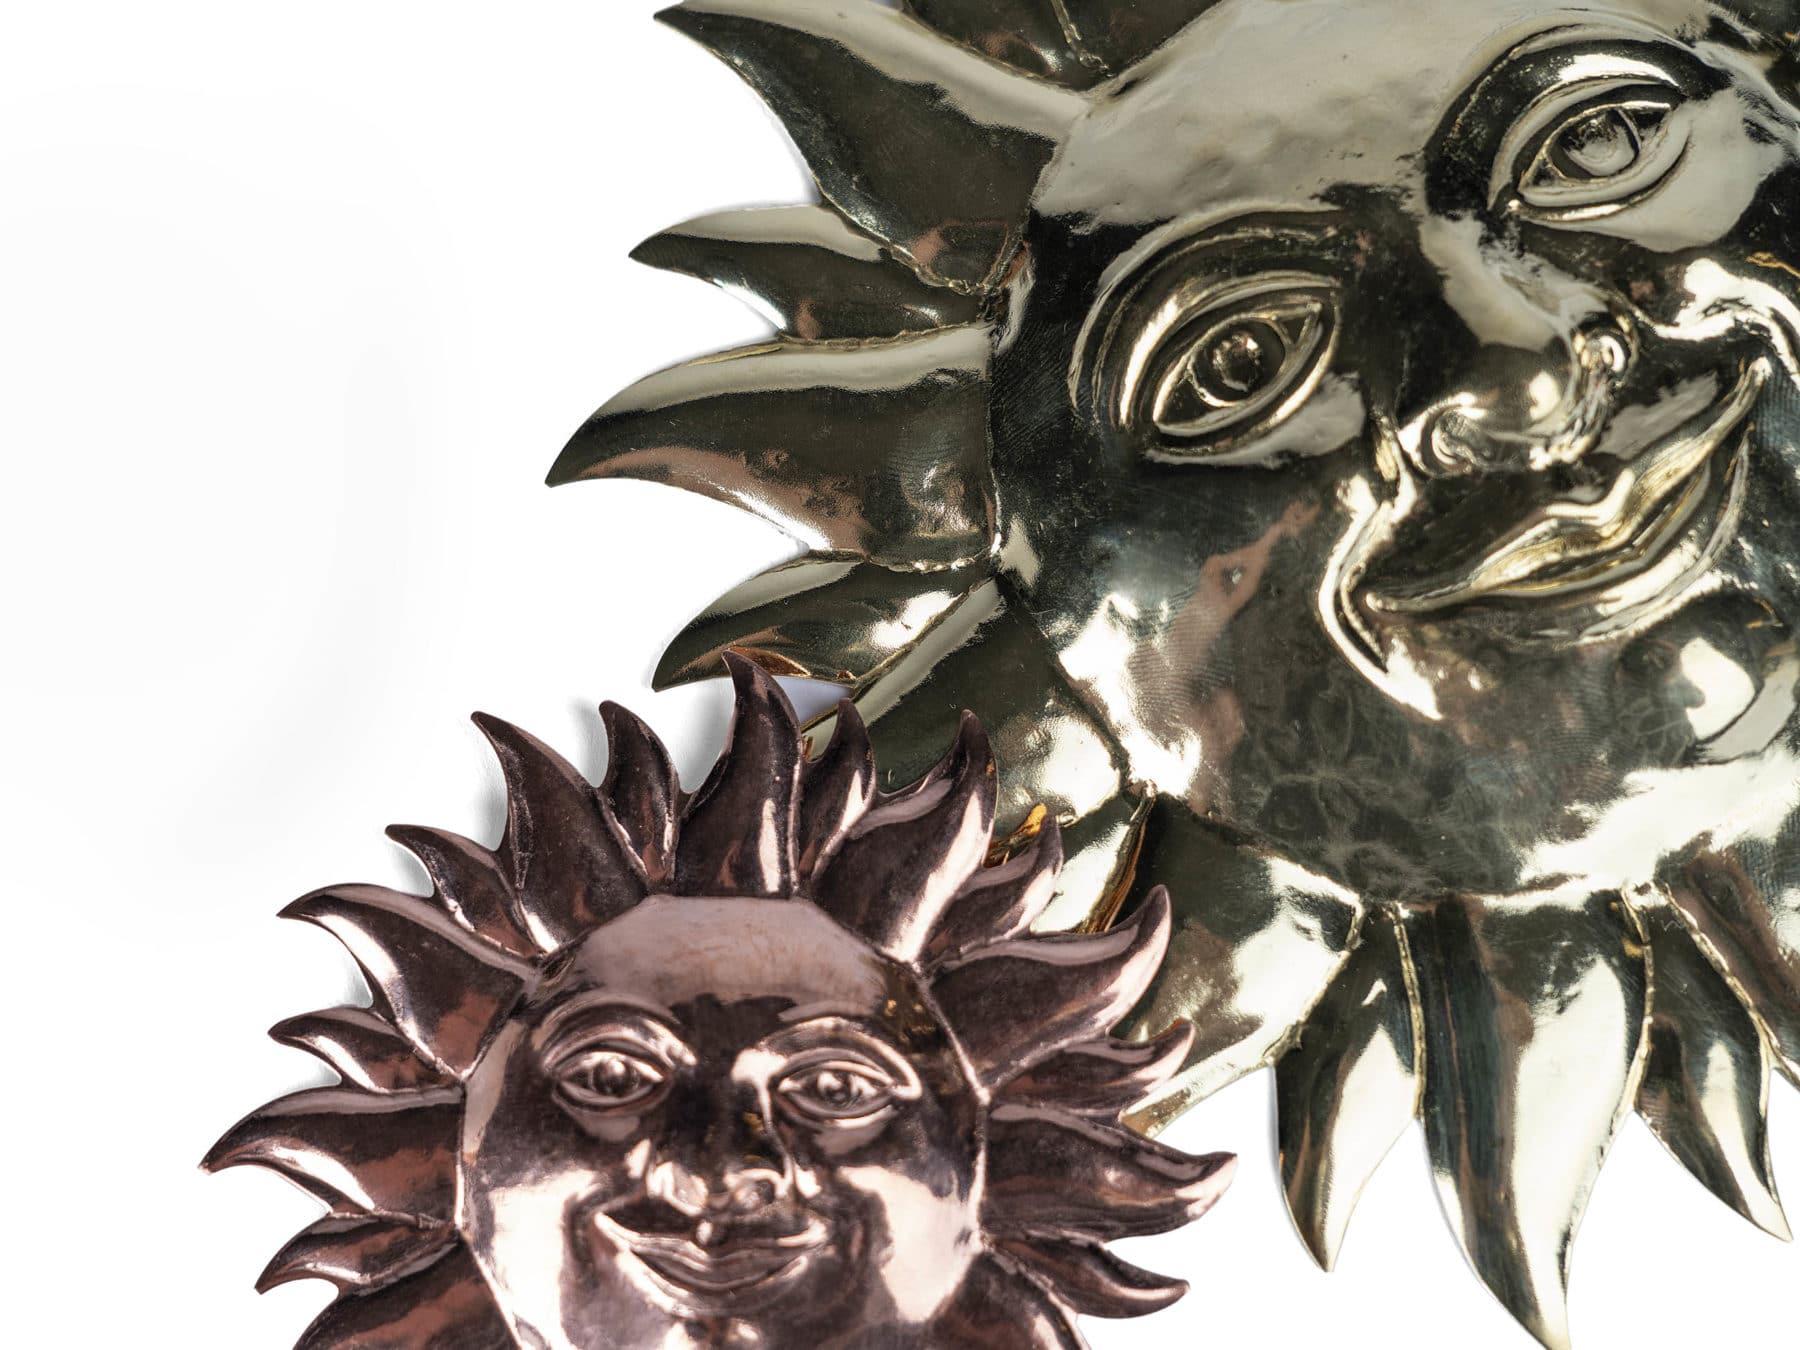 Deko Wanddeko Sonne Messing swissmade handmade KURTS.ch Kupfer